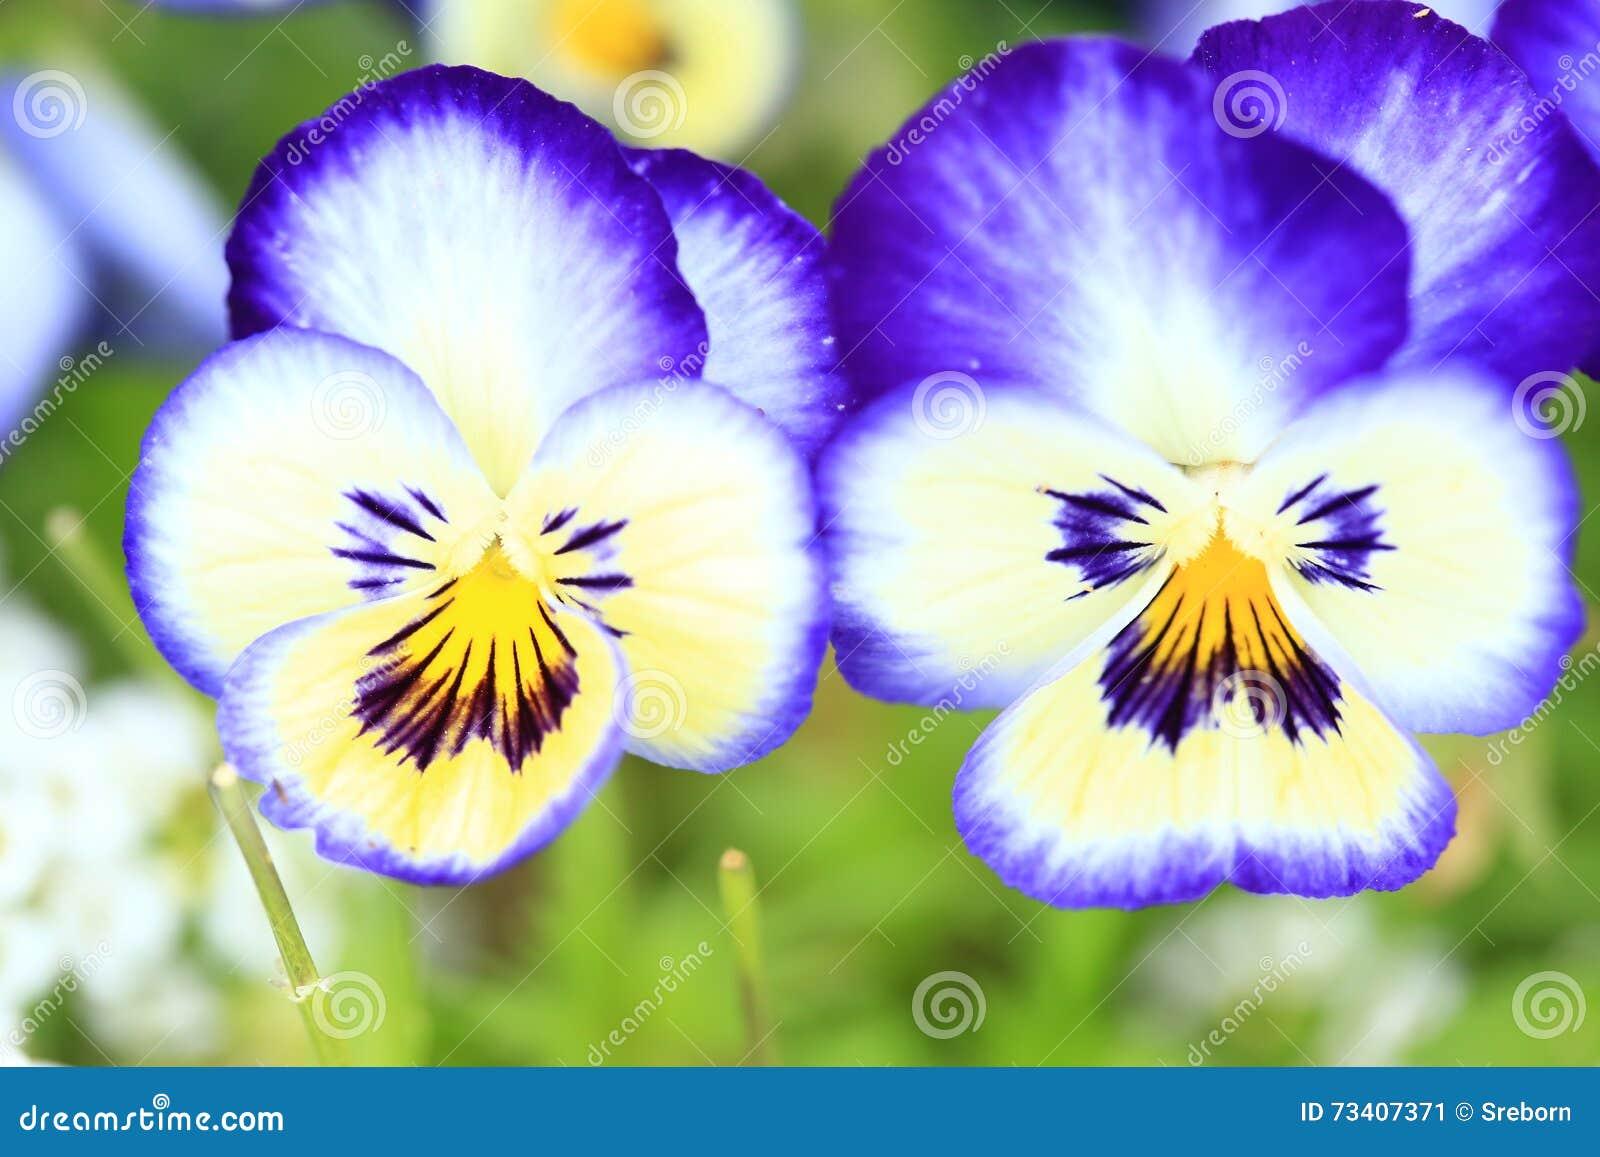 Violas flowers in the garden